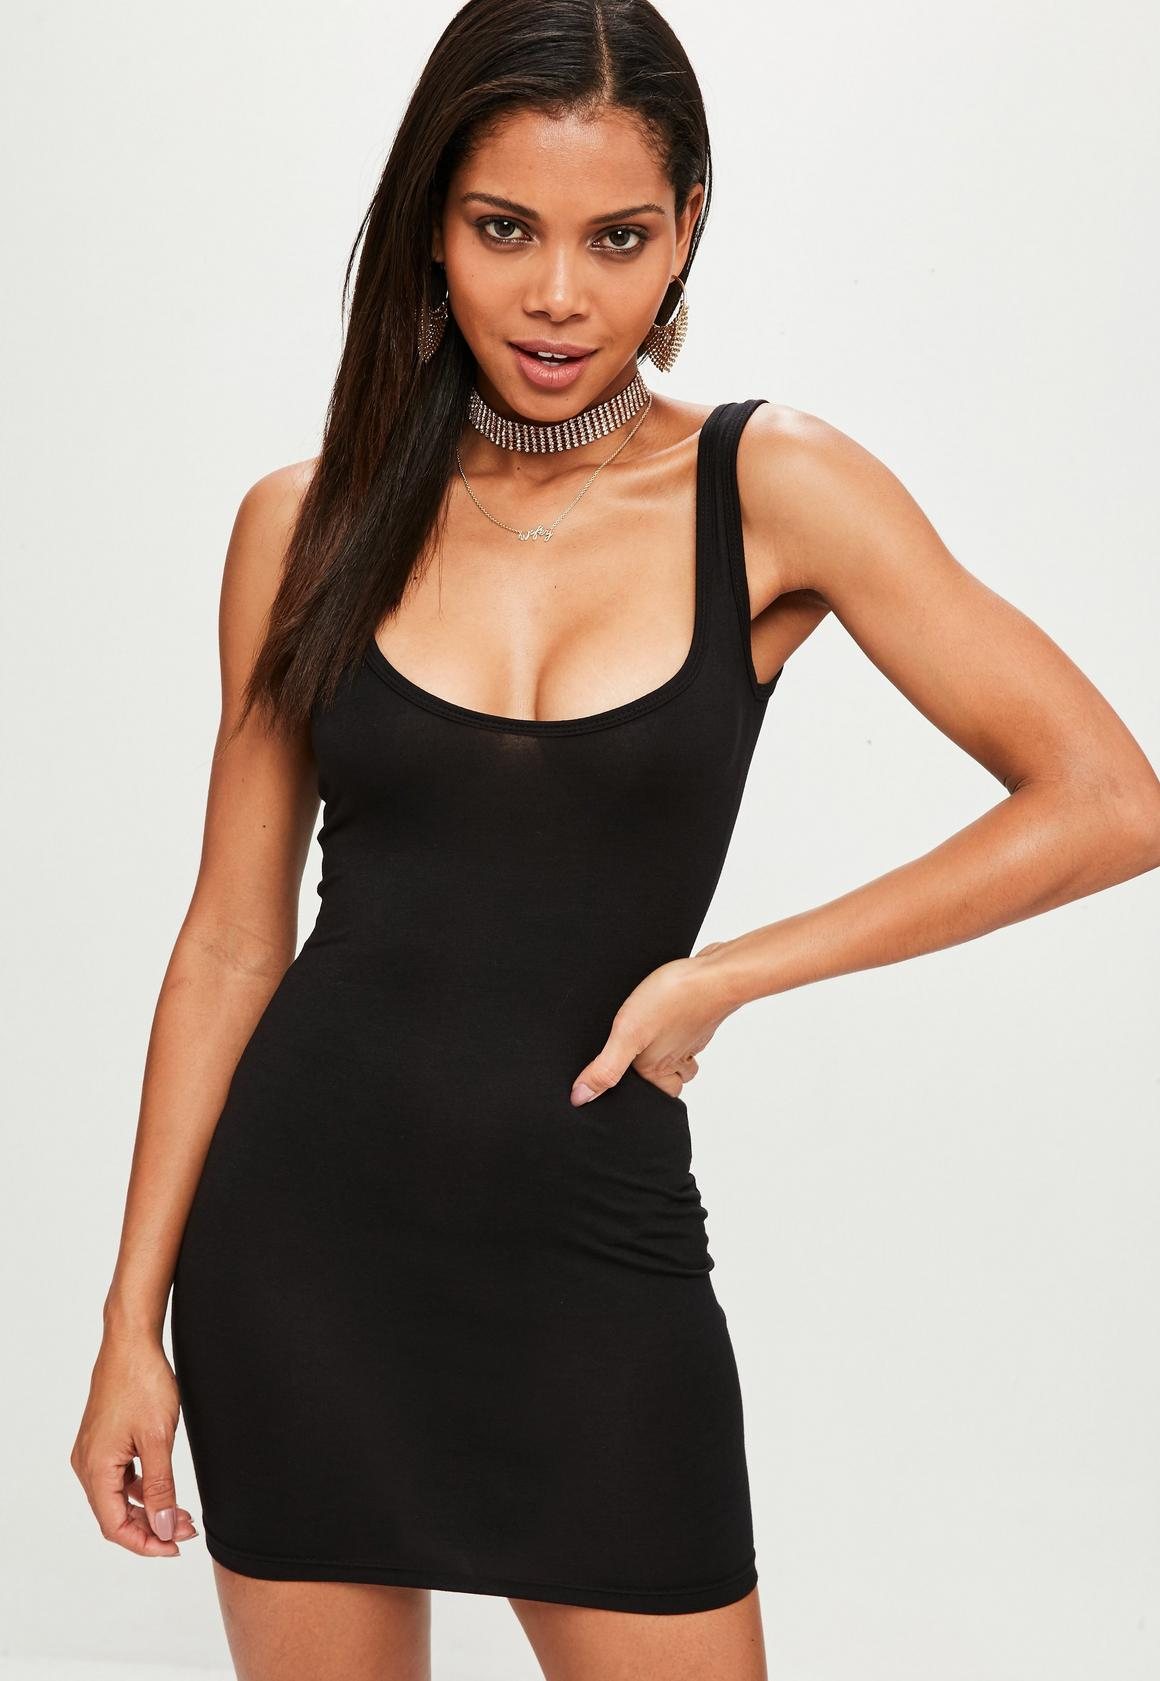 Dresses | Shop Women's Dresses Online at Missguided